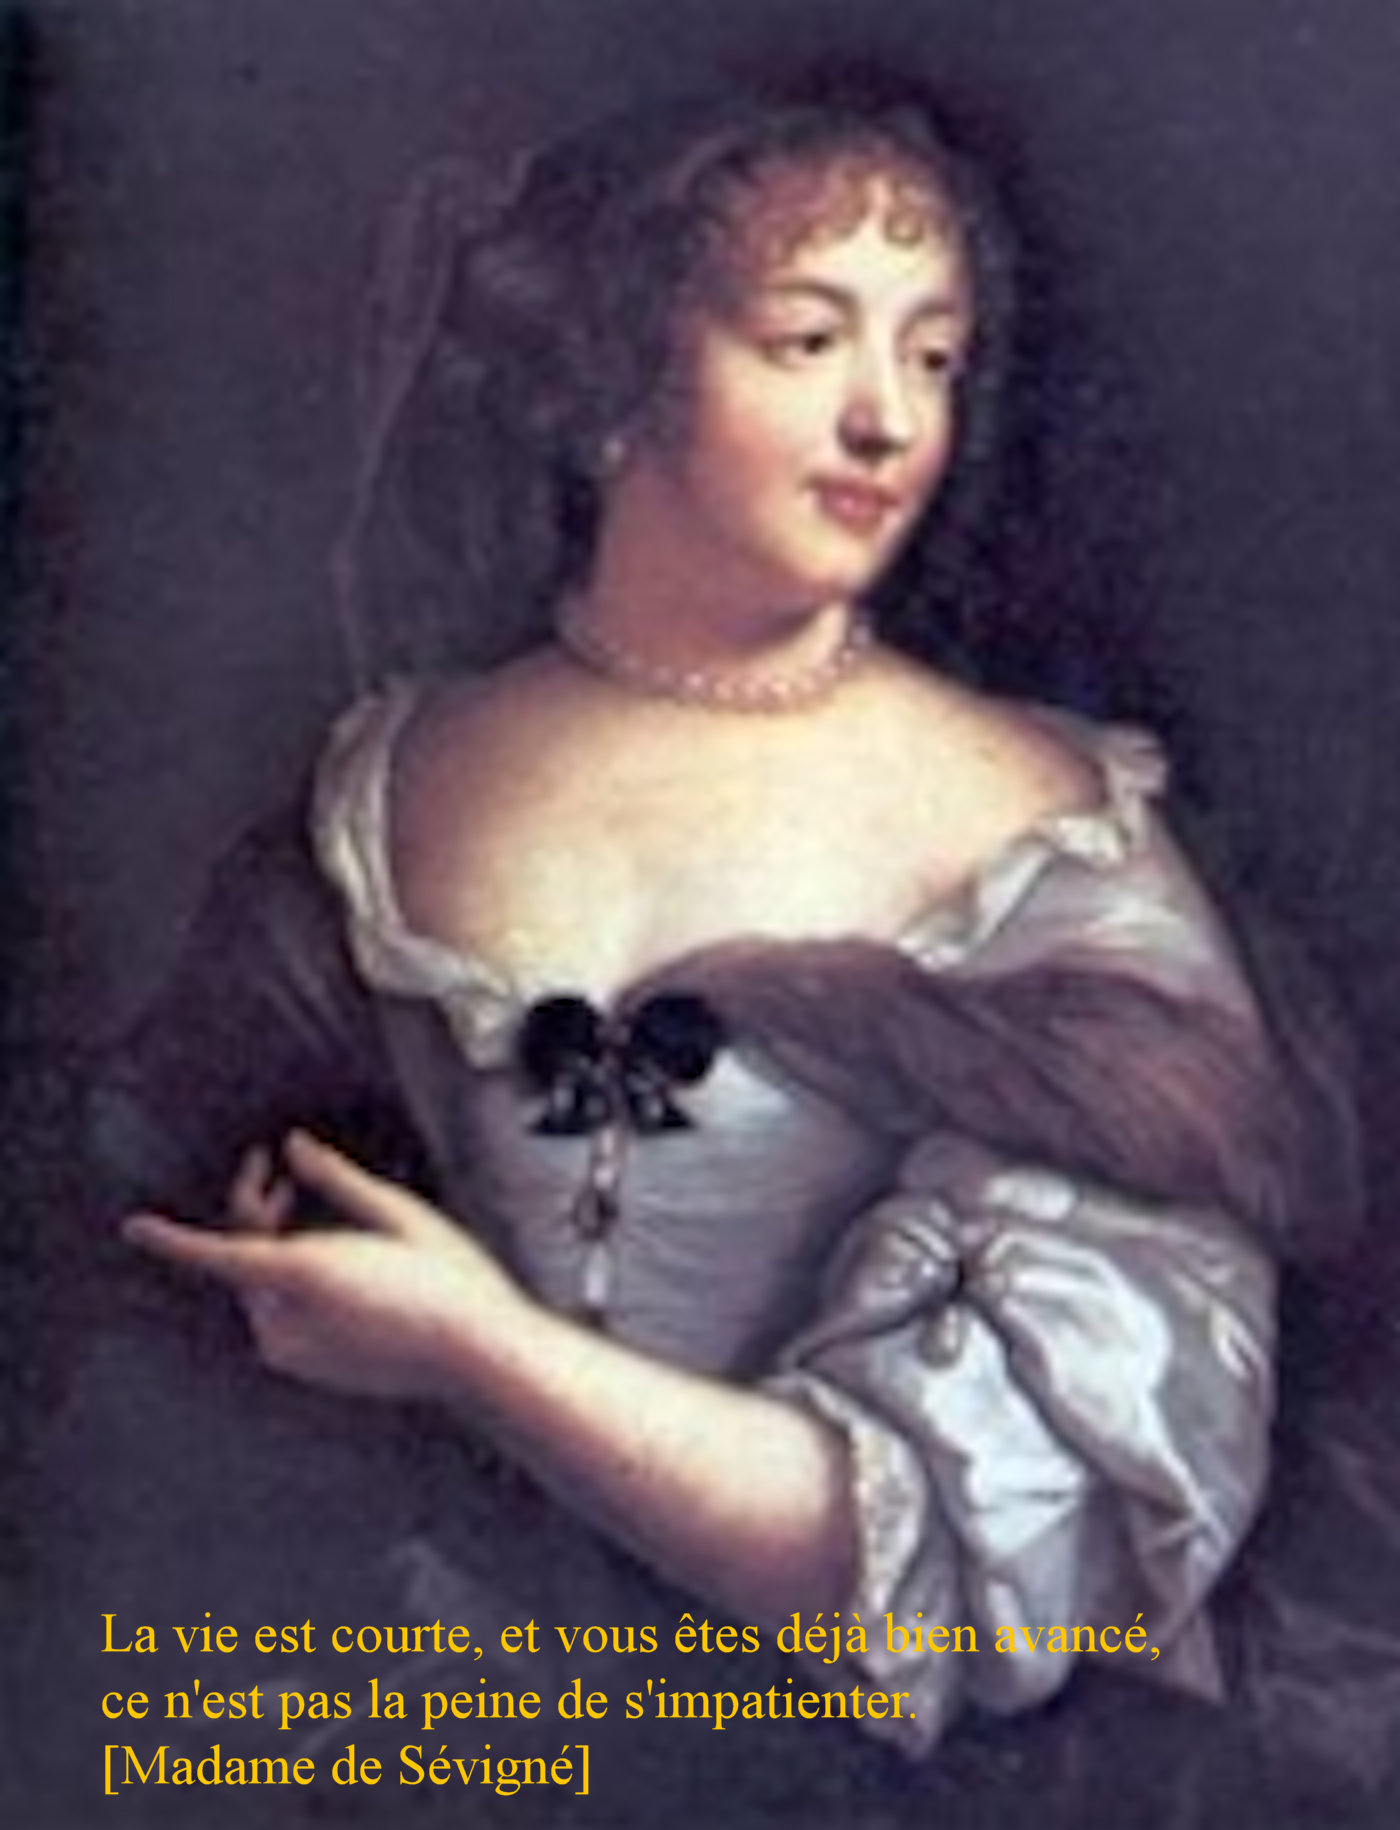 Madame de Sévigné.jpg